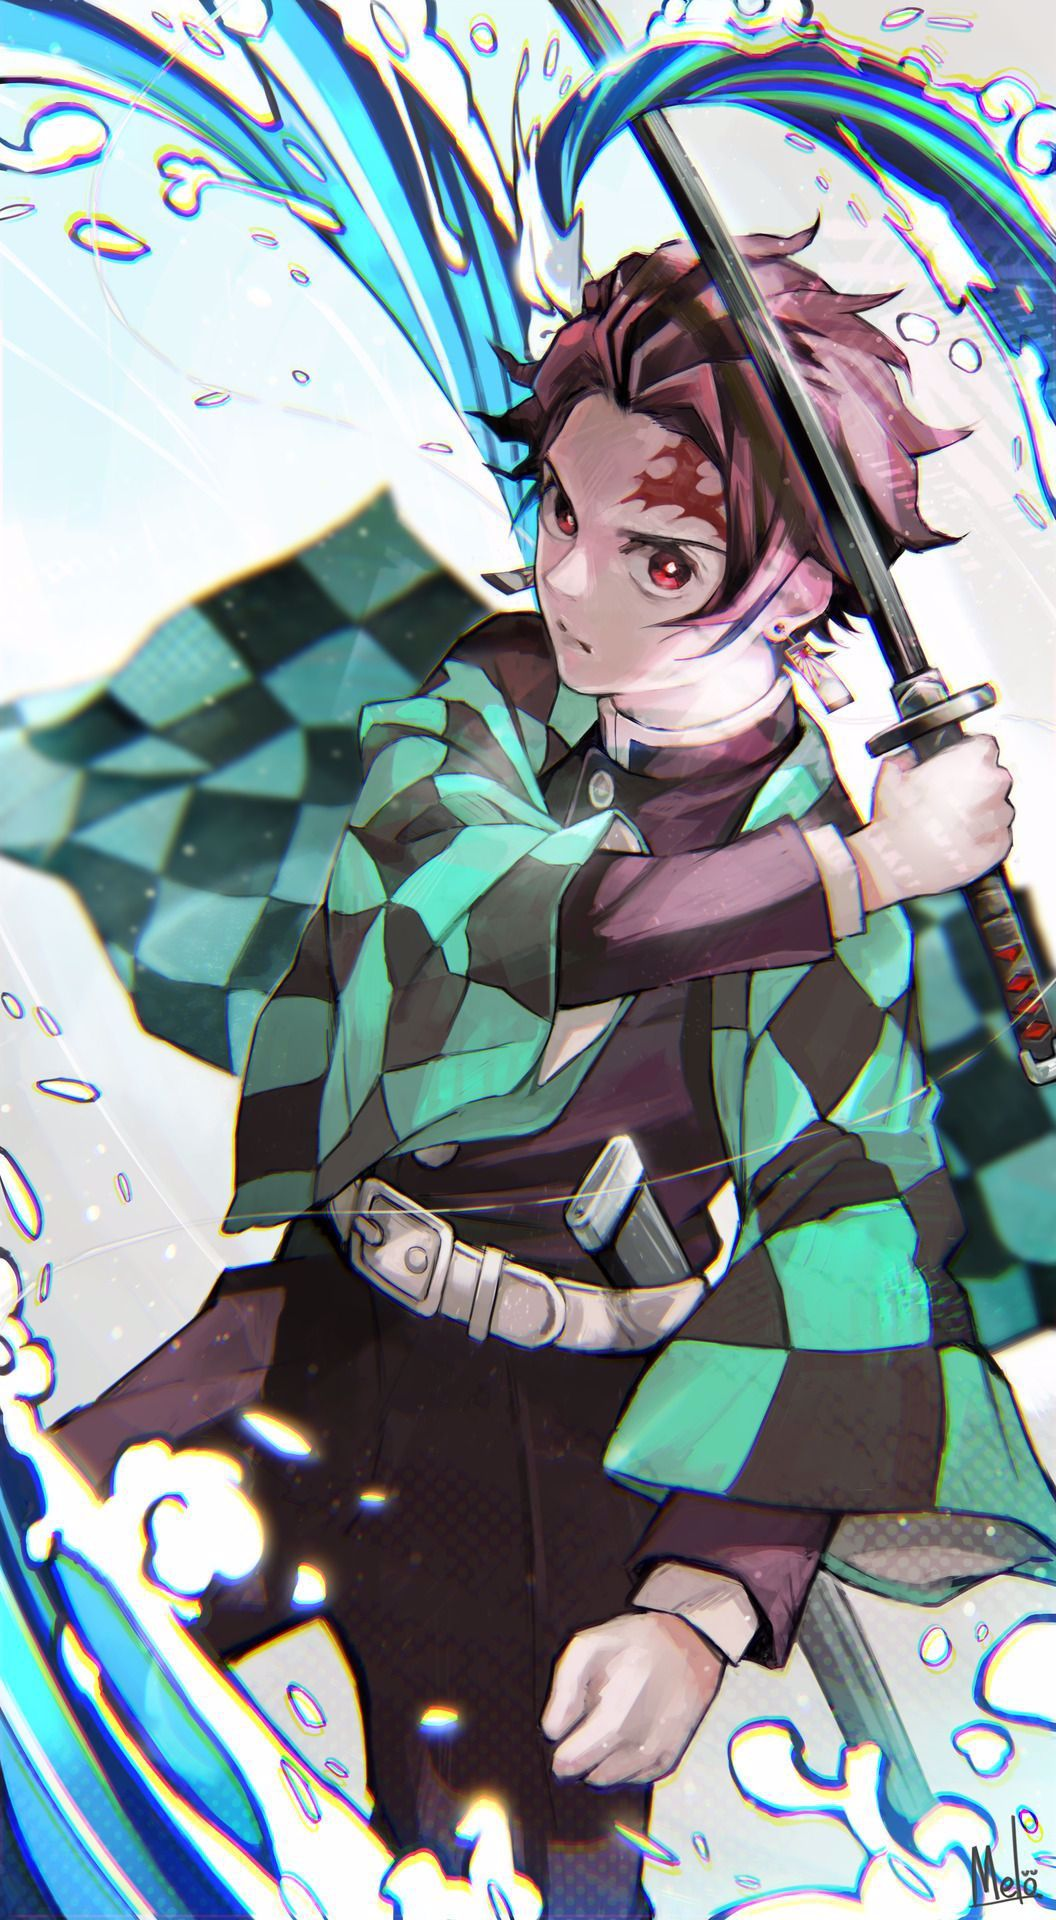 Tanjirou Kamado Demon Slayer Kimetsu No Yaiba By Melo 9ba On Tumblr In 2020 Anime Demon Anime Anime Images